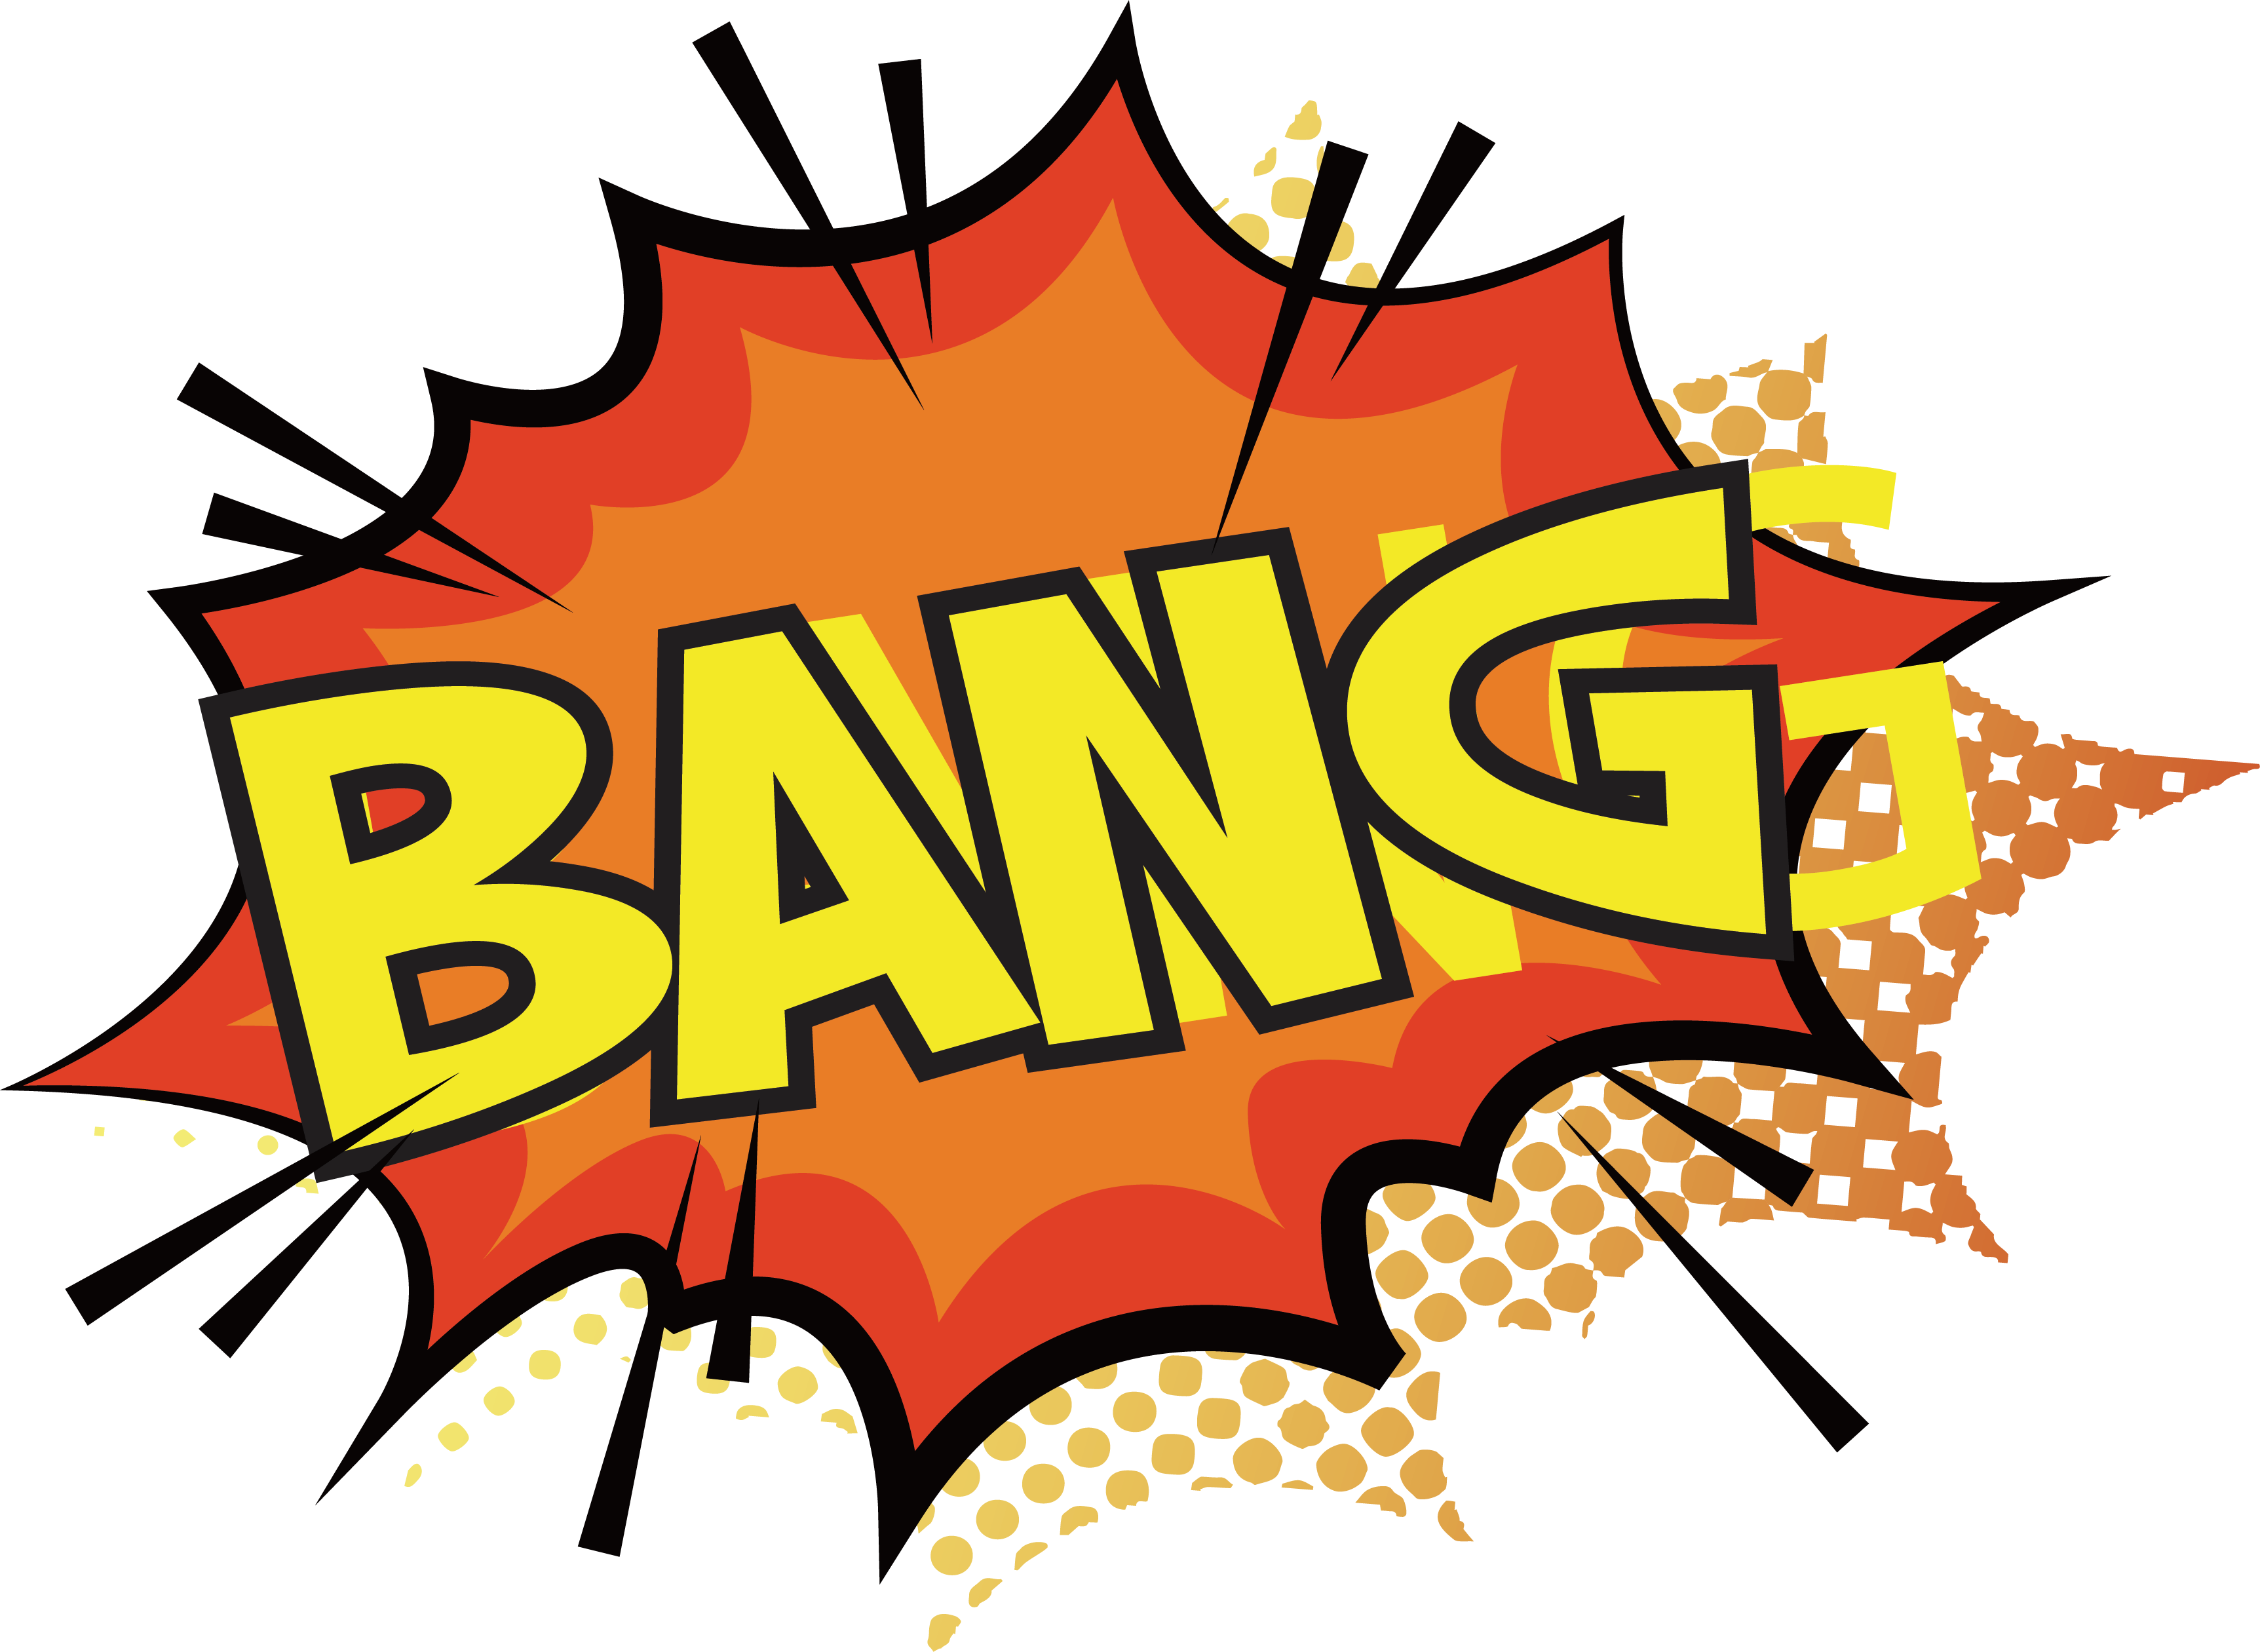 Explosion comic book